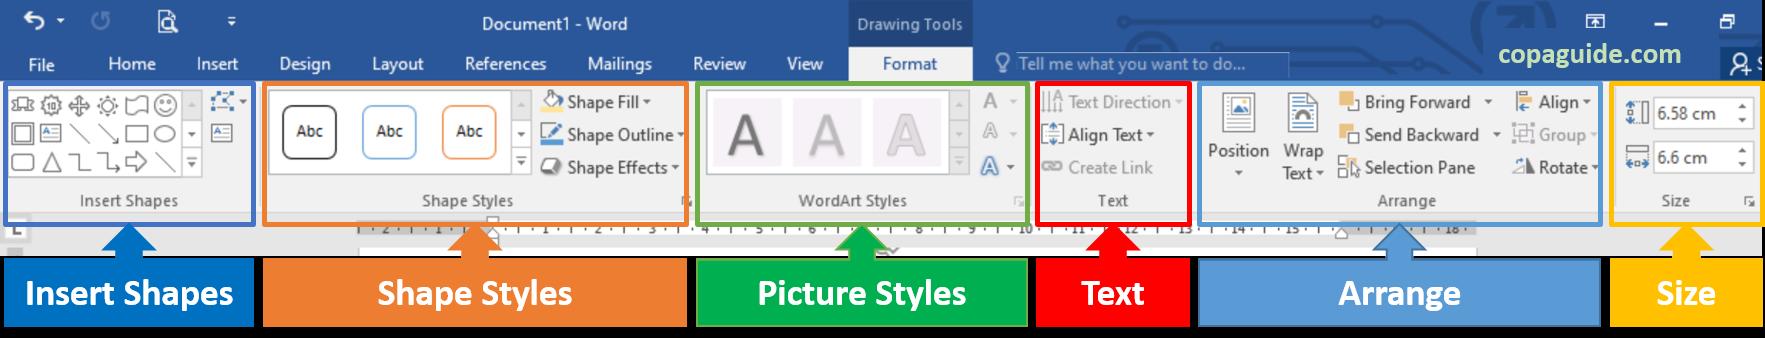 Using Drawing Tools to Edit Shapes in MS-Word Hindi Notes